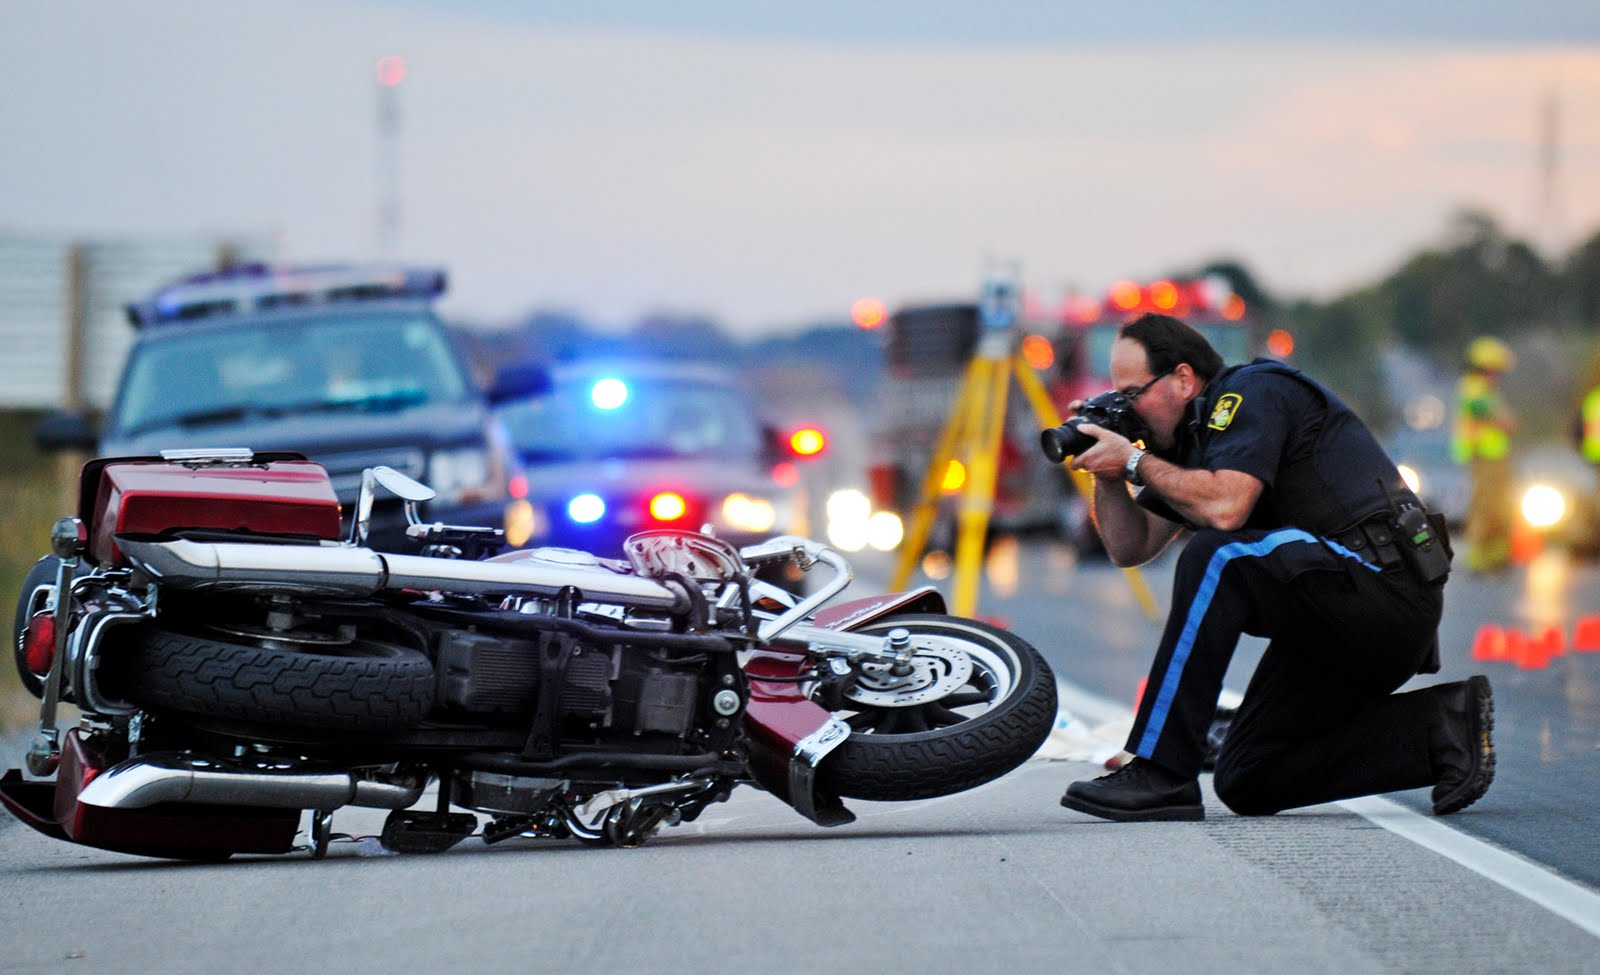 Motorcycle accident crash1 |